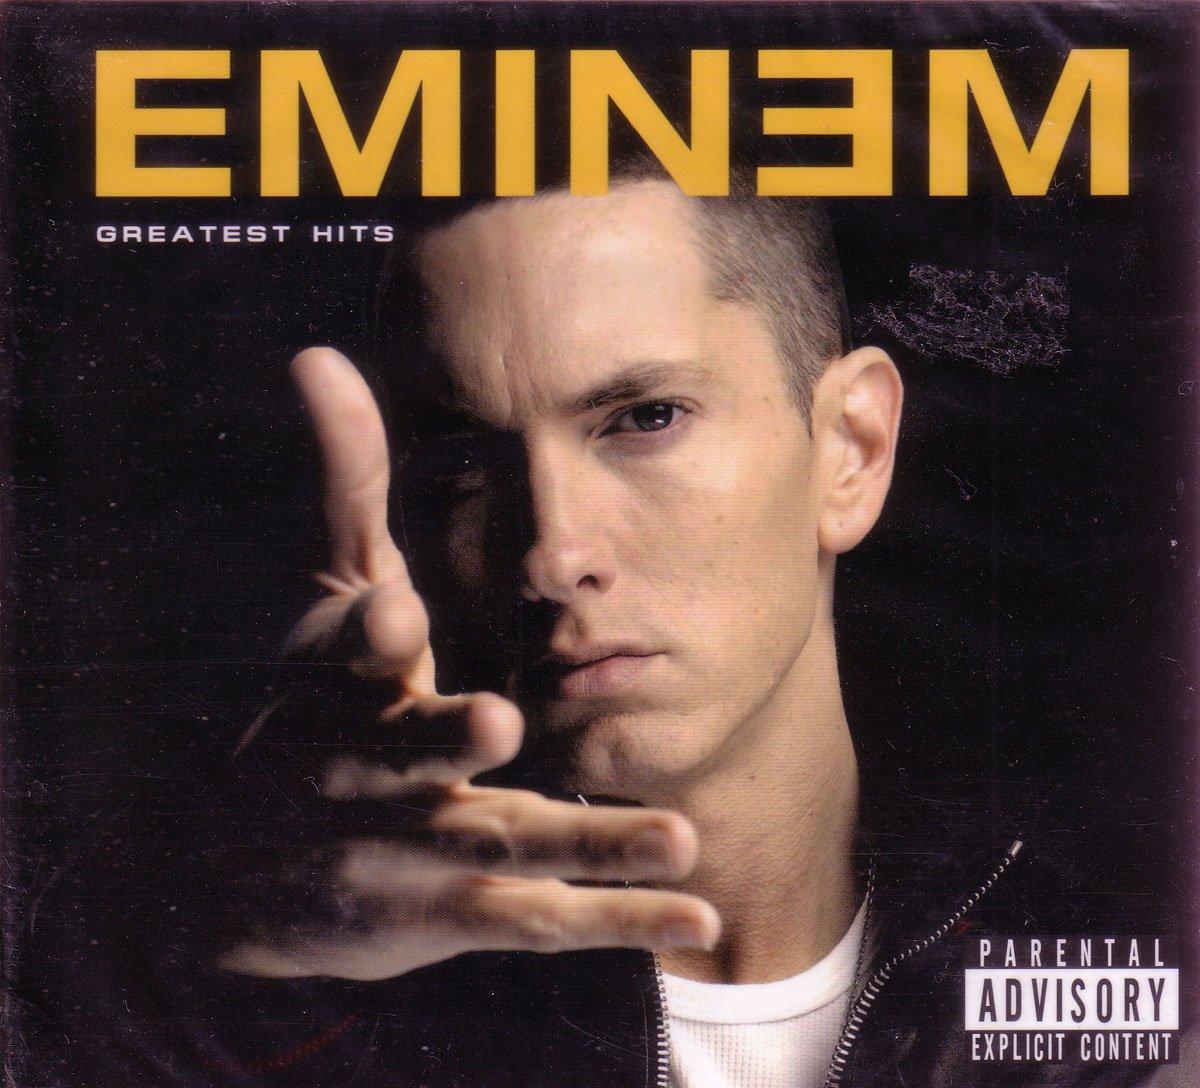 Curtain call the hits deluxe version itunes plus m4a album - De Afar Eminem The Show 2002 Eladio Prezint Hip Eminem Curtain Call Deluxe Zip Sharebeast Menzilperde Eminem Curtain Call Rar